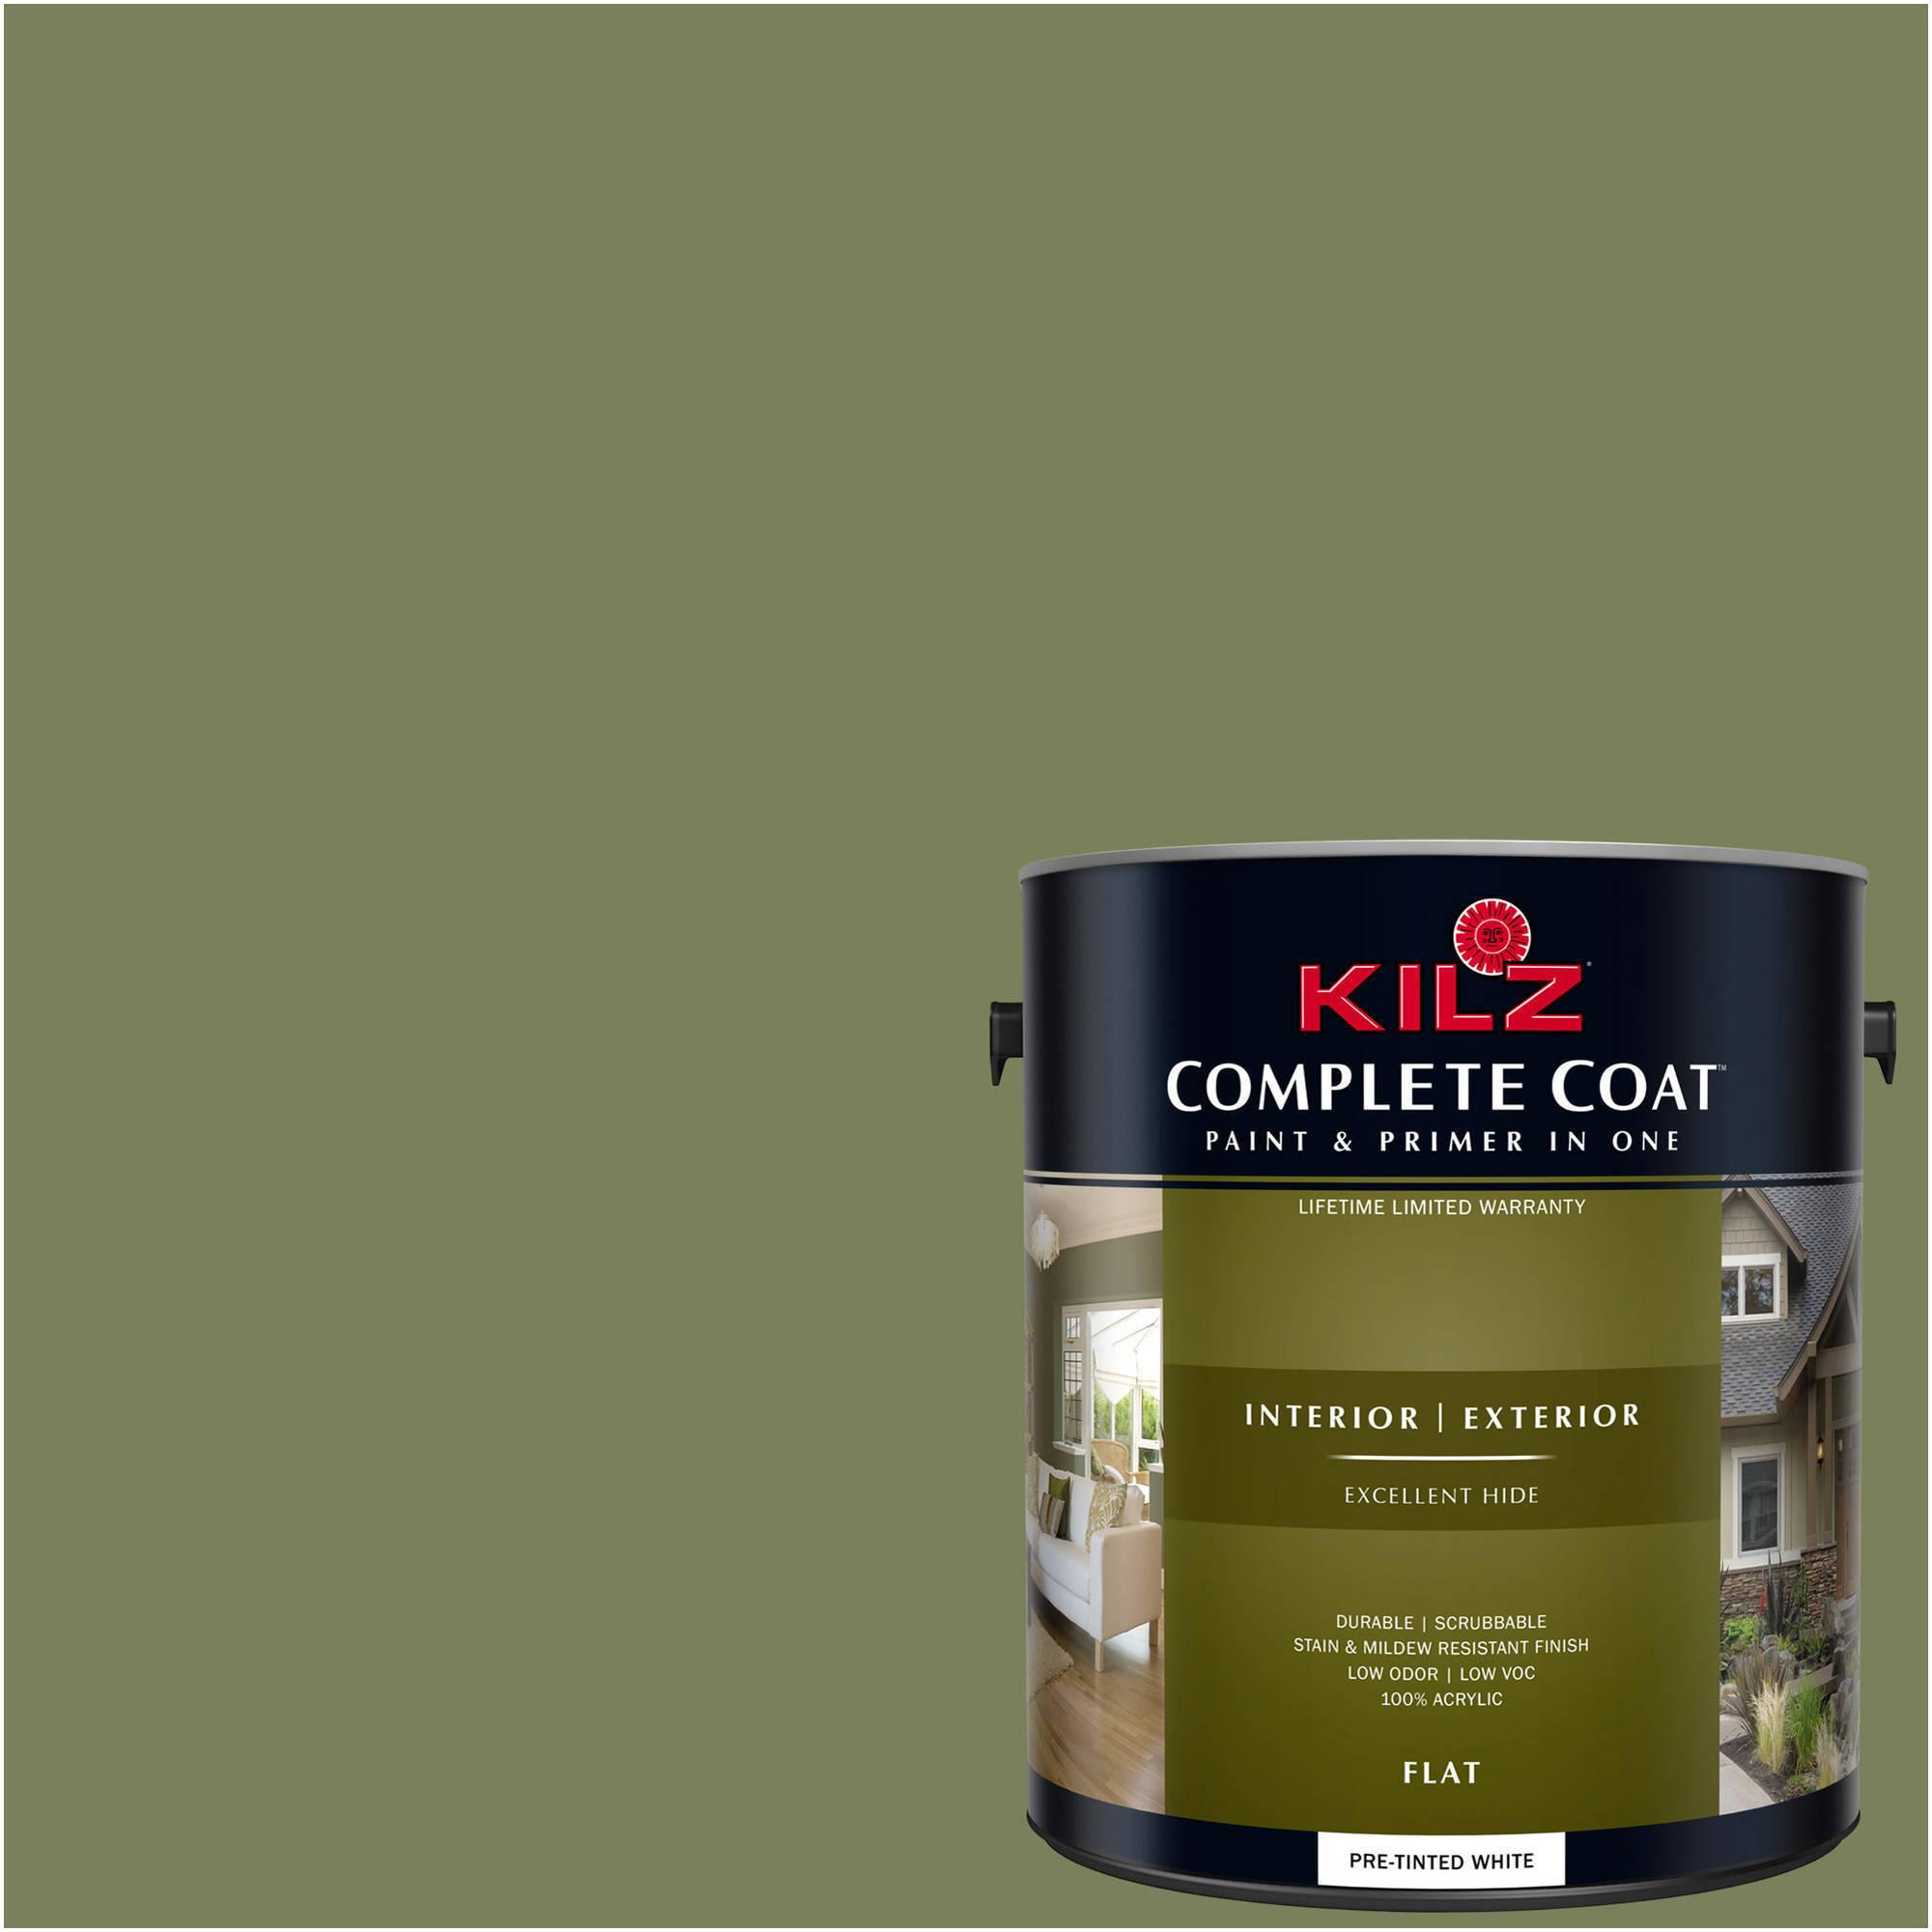 KILZ COMPLETE COAT Interior/Exterior Paint & Primer in One #LG120-02 Cavern Moss